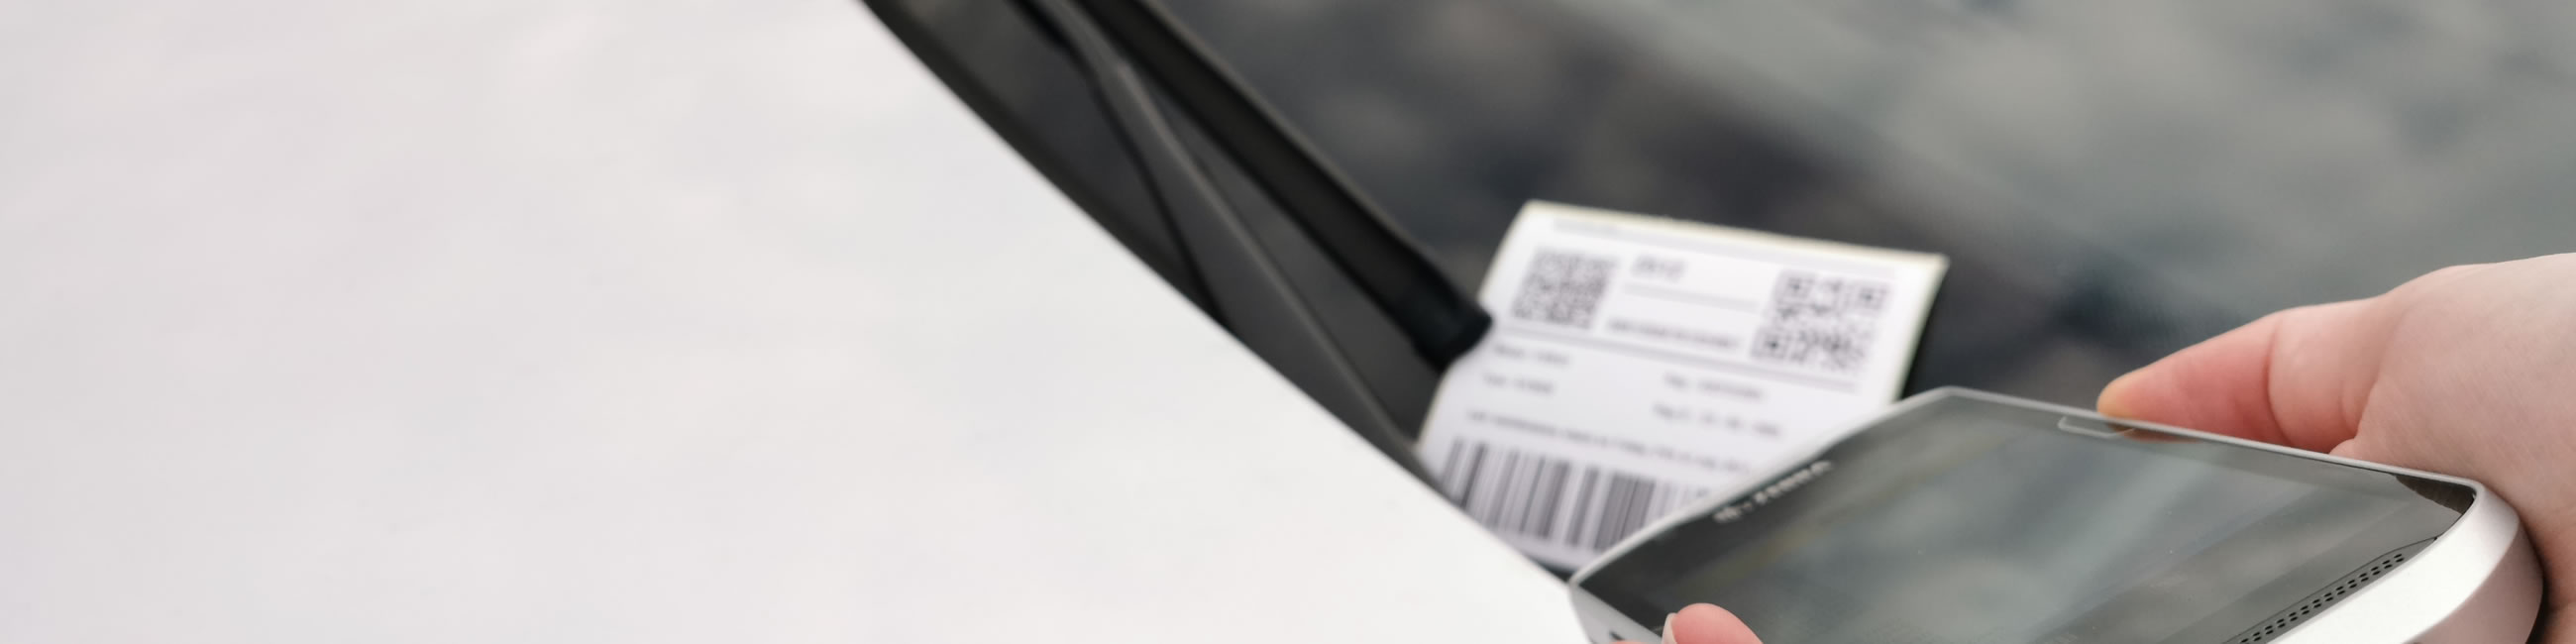 Barcode scanning ERP